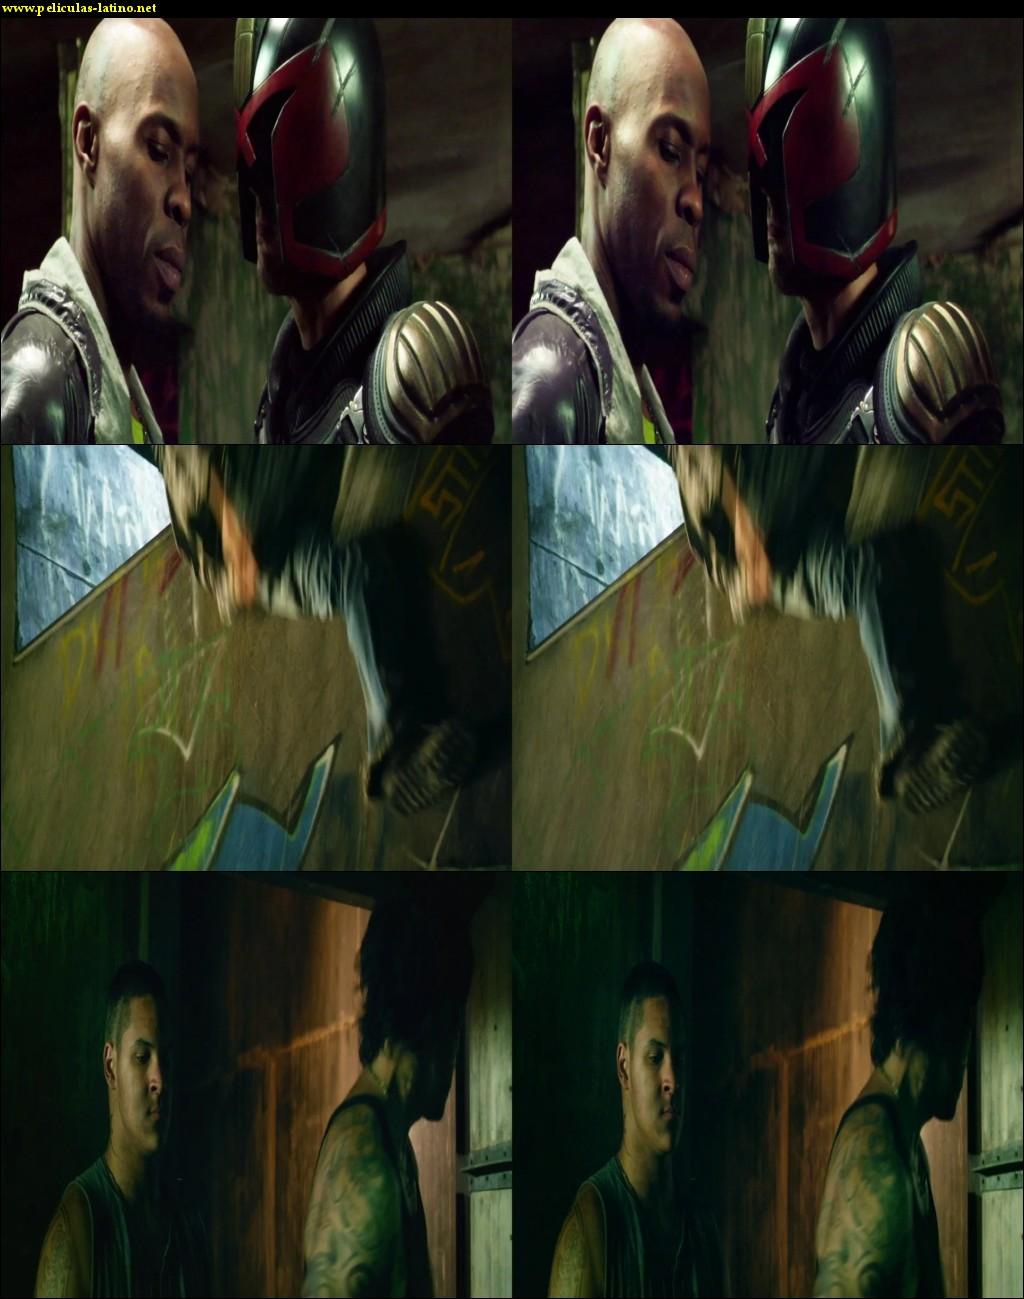 Imagen 1 Dredd película HD 1080p 3D SBS latino 2012